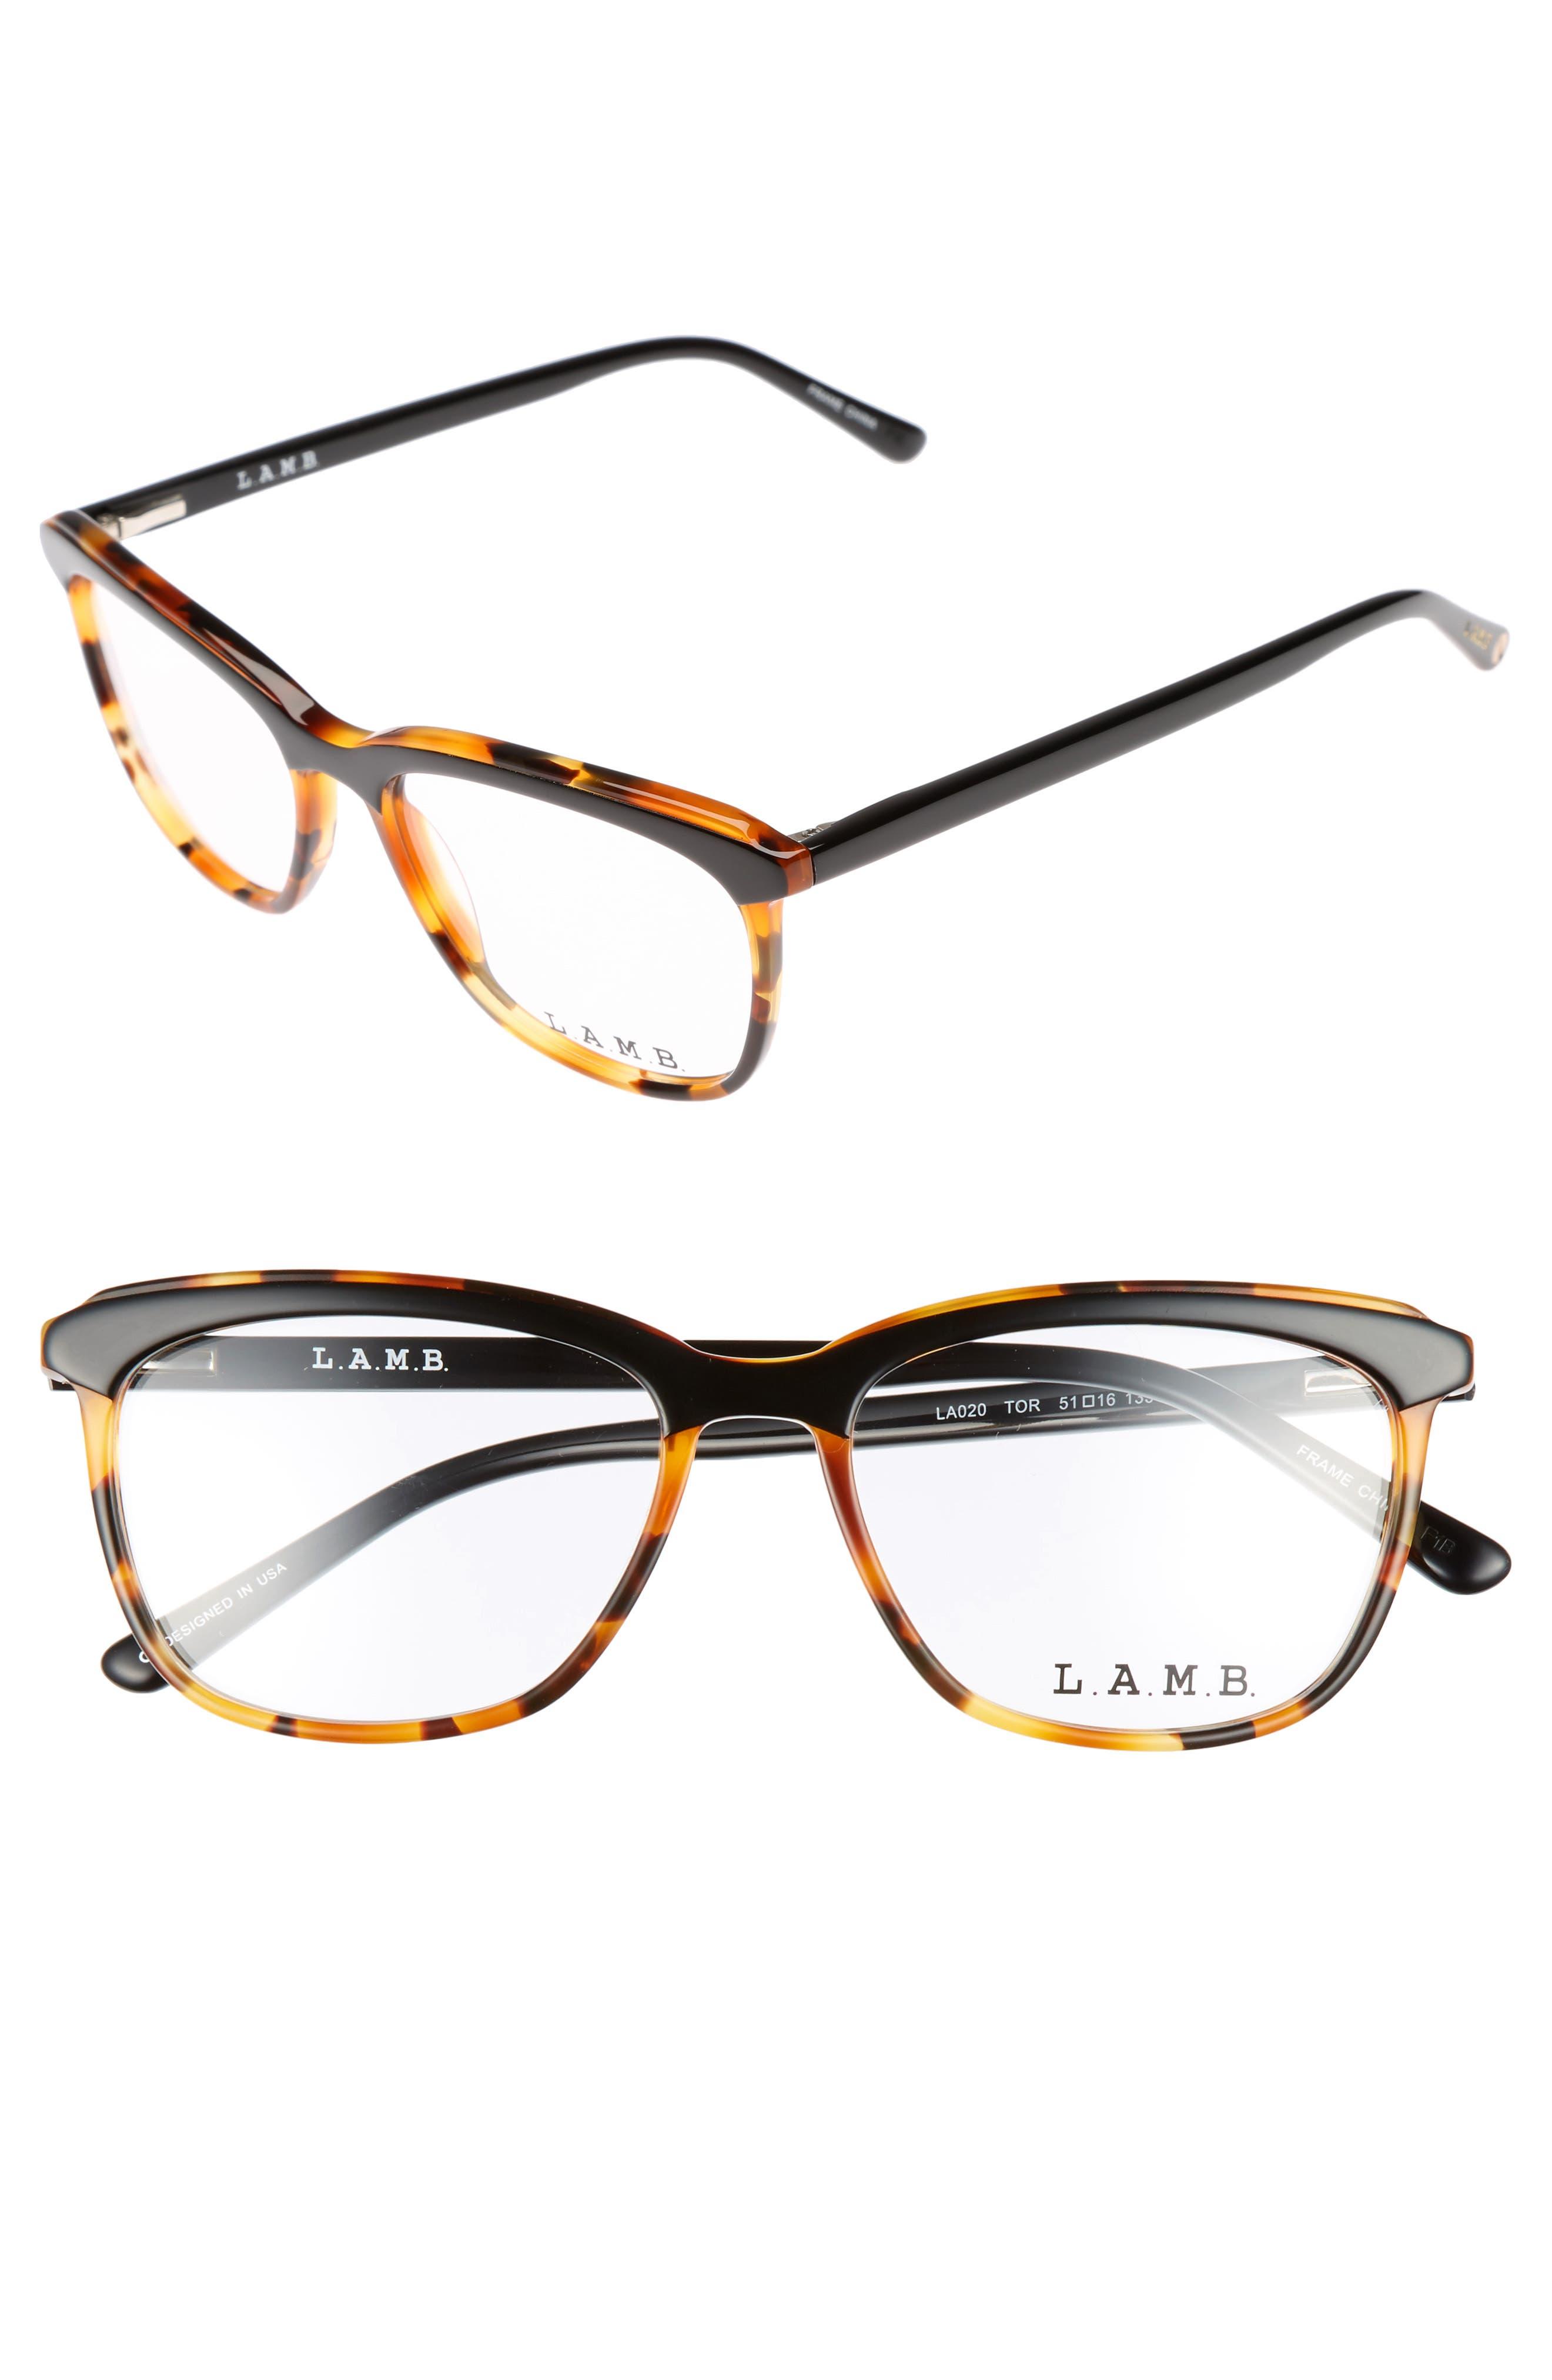 51mm Optical Square Glasses,                             Main thumbnail 1, color,                             001